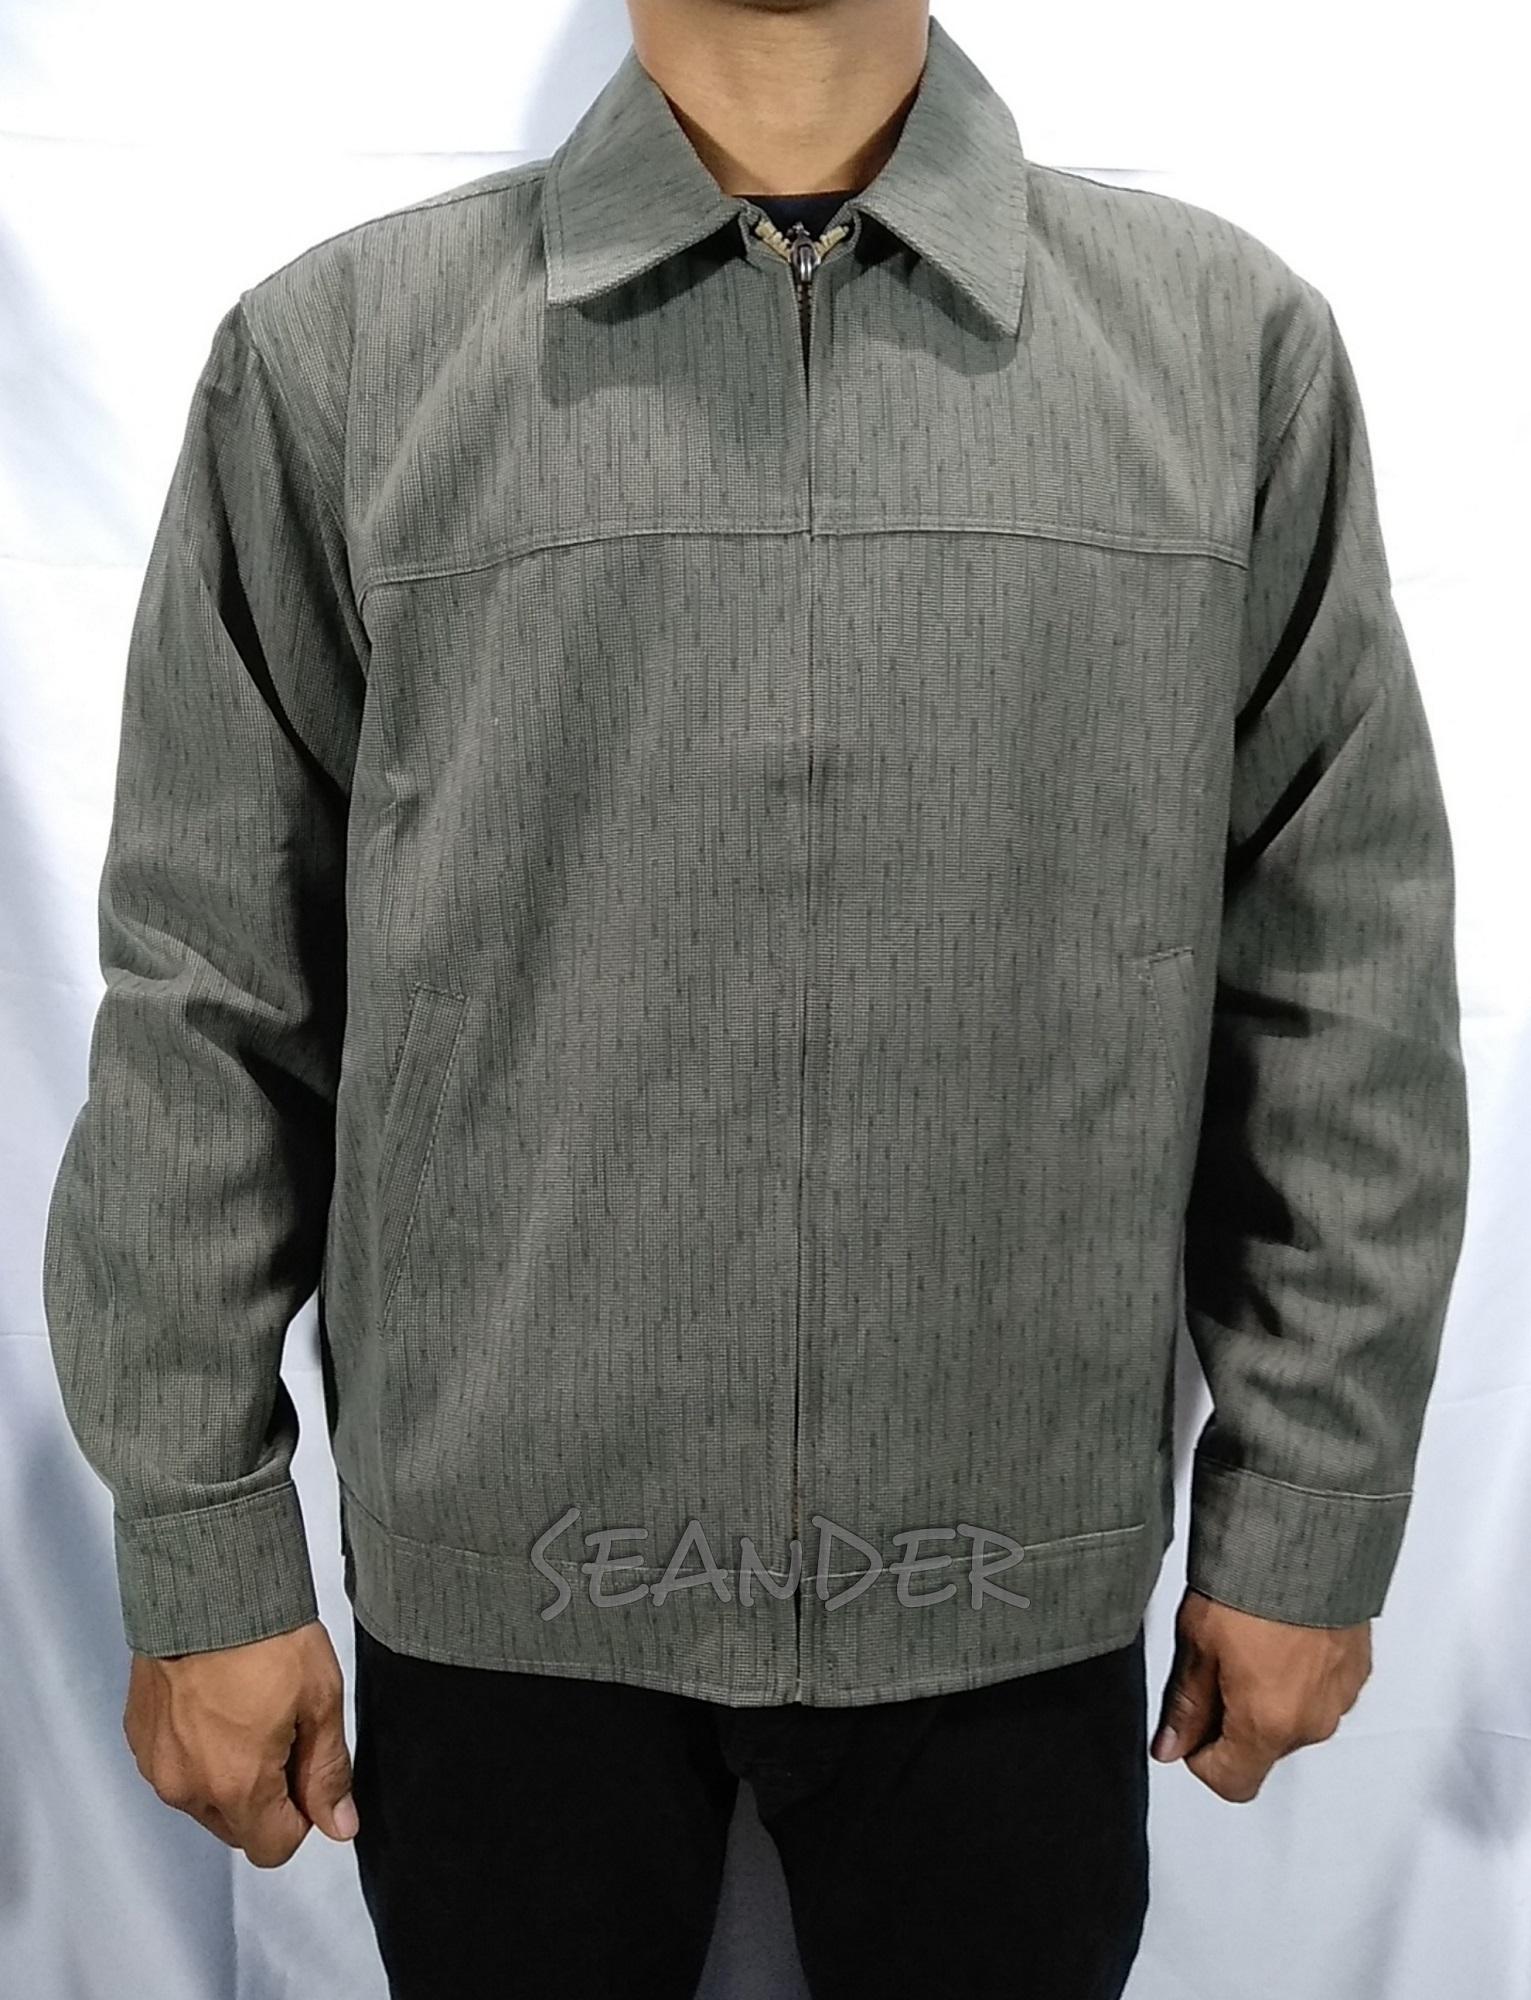 Buy Sell Cheapest Jaket Formal Jasket Best Quality Product Deals Jas Resleting Semi Bolero